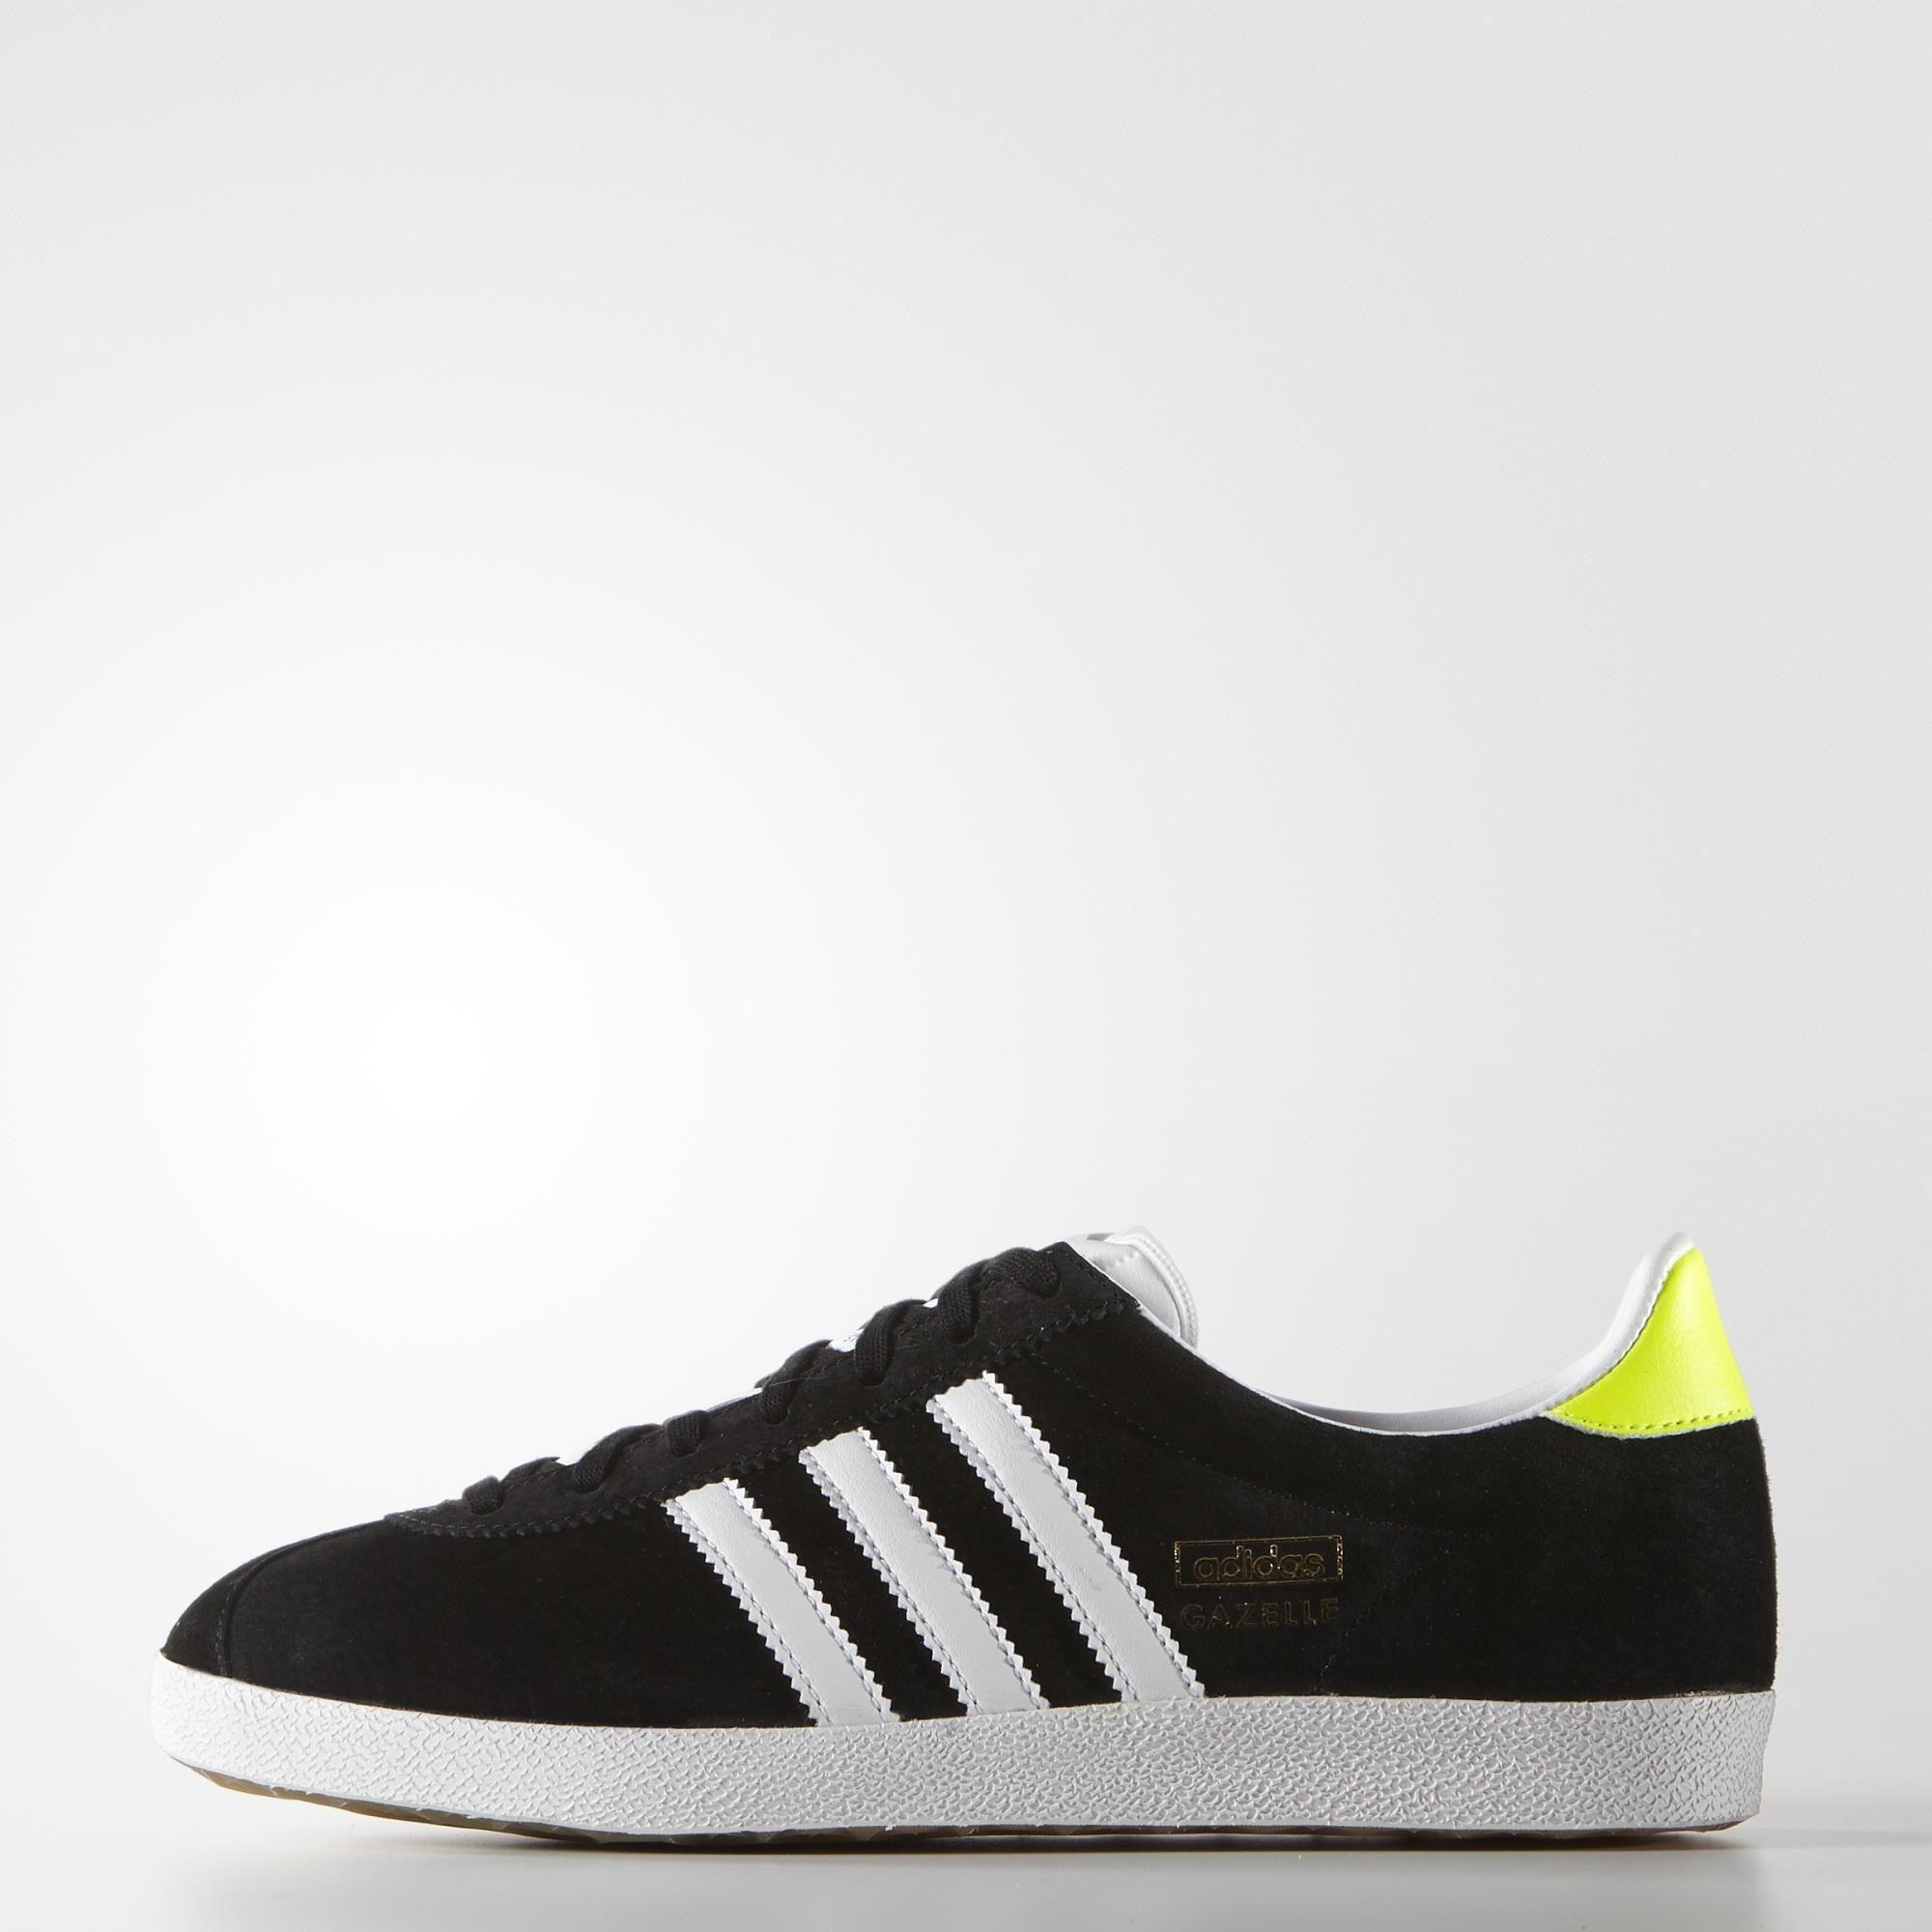 adidas gazelle light onix